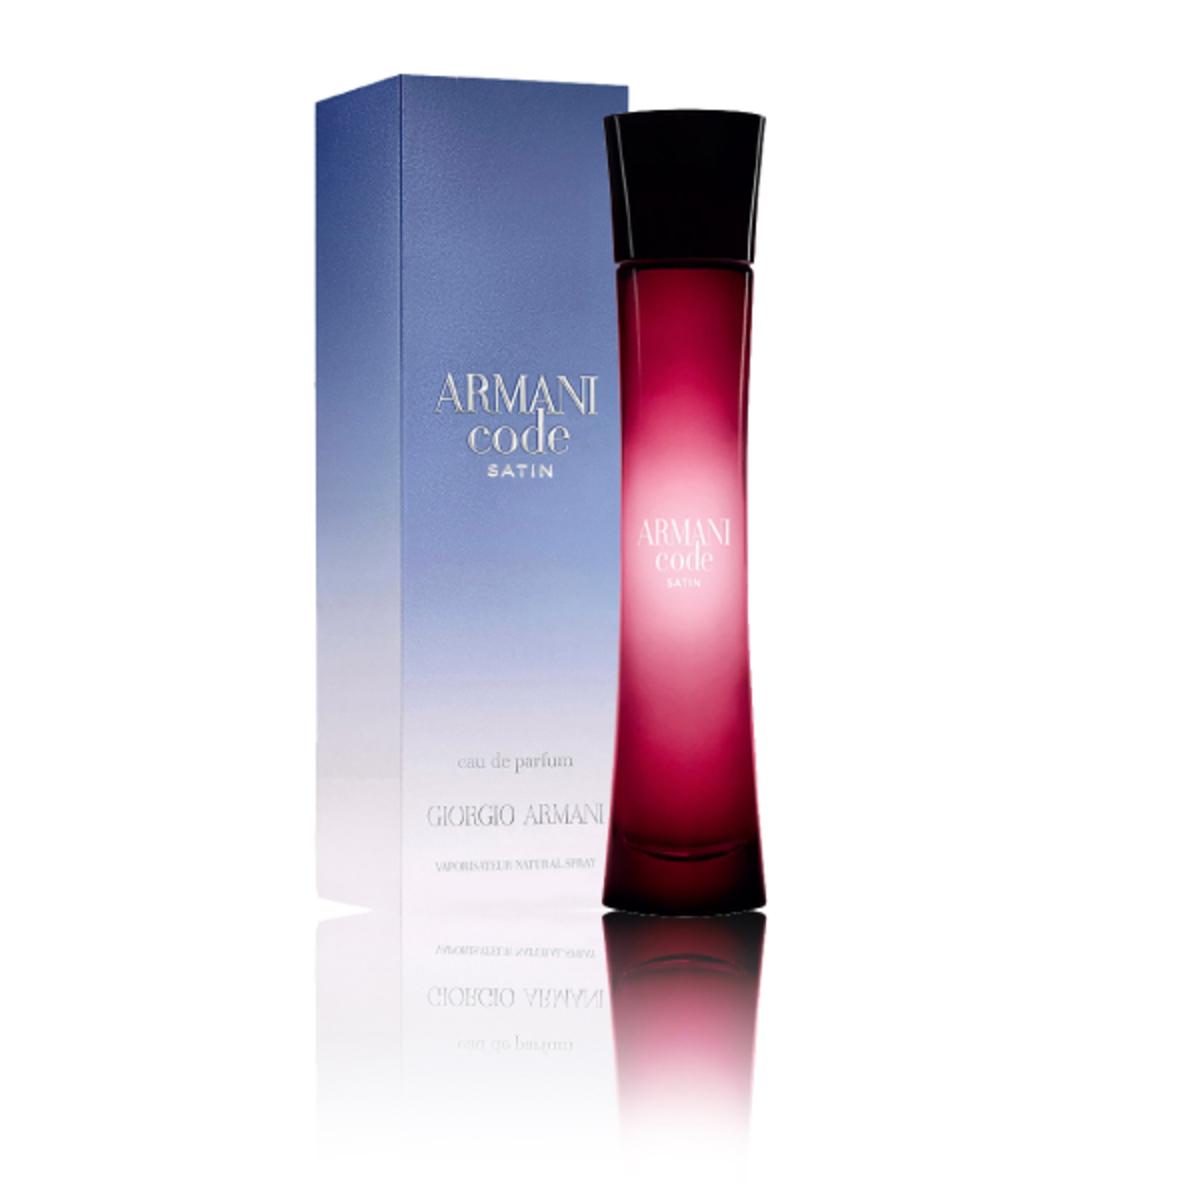 9dc6a09dd275 GIORGIO ARMANI Armani Code Satin Eau de Parfum Spray for Women 75ml ...